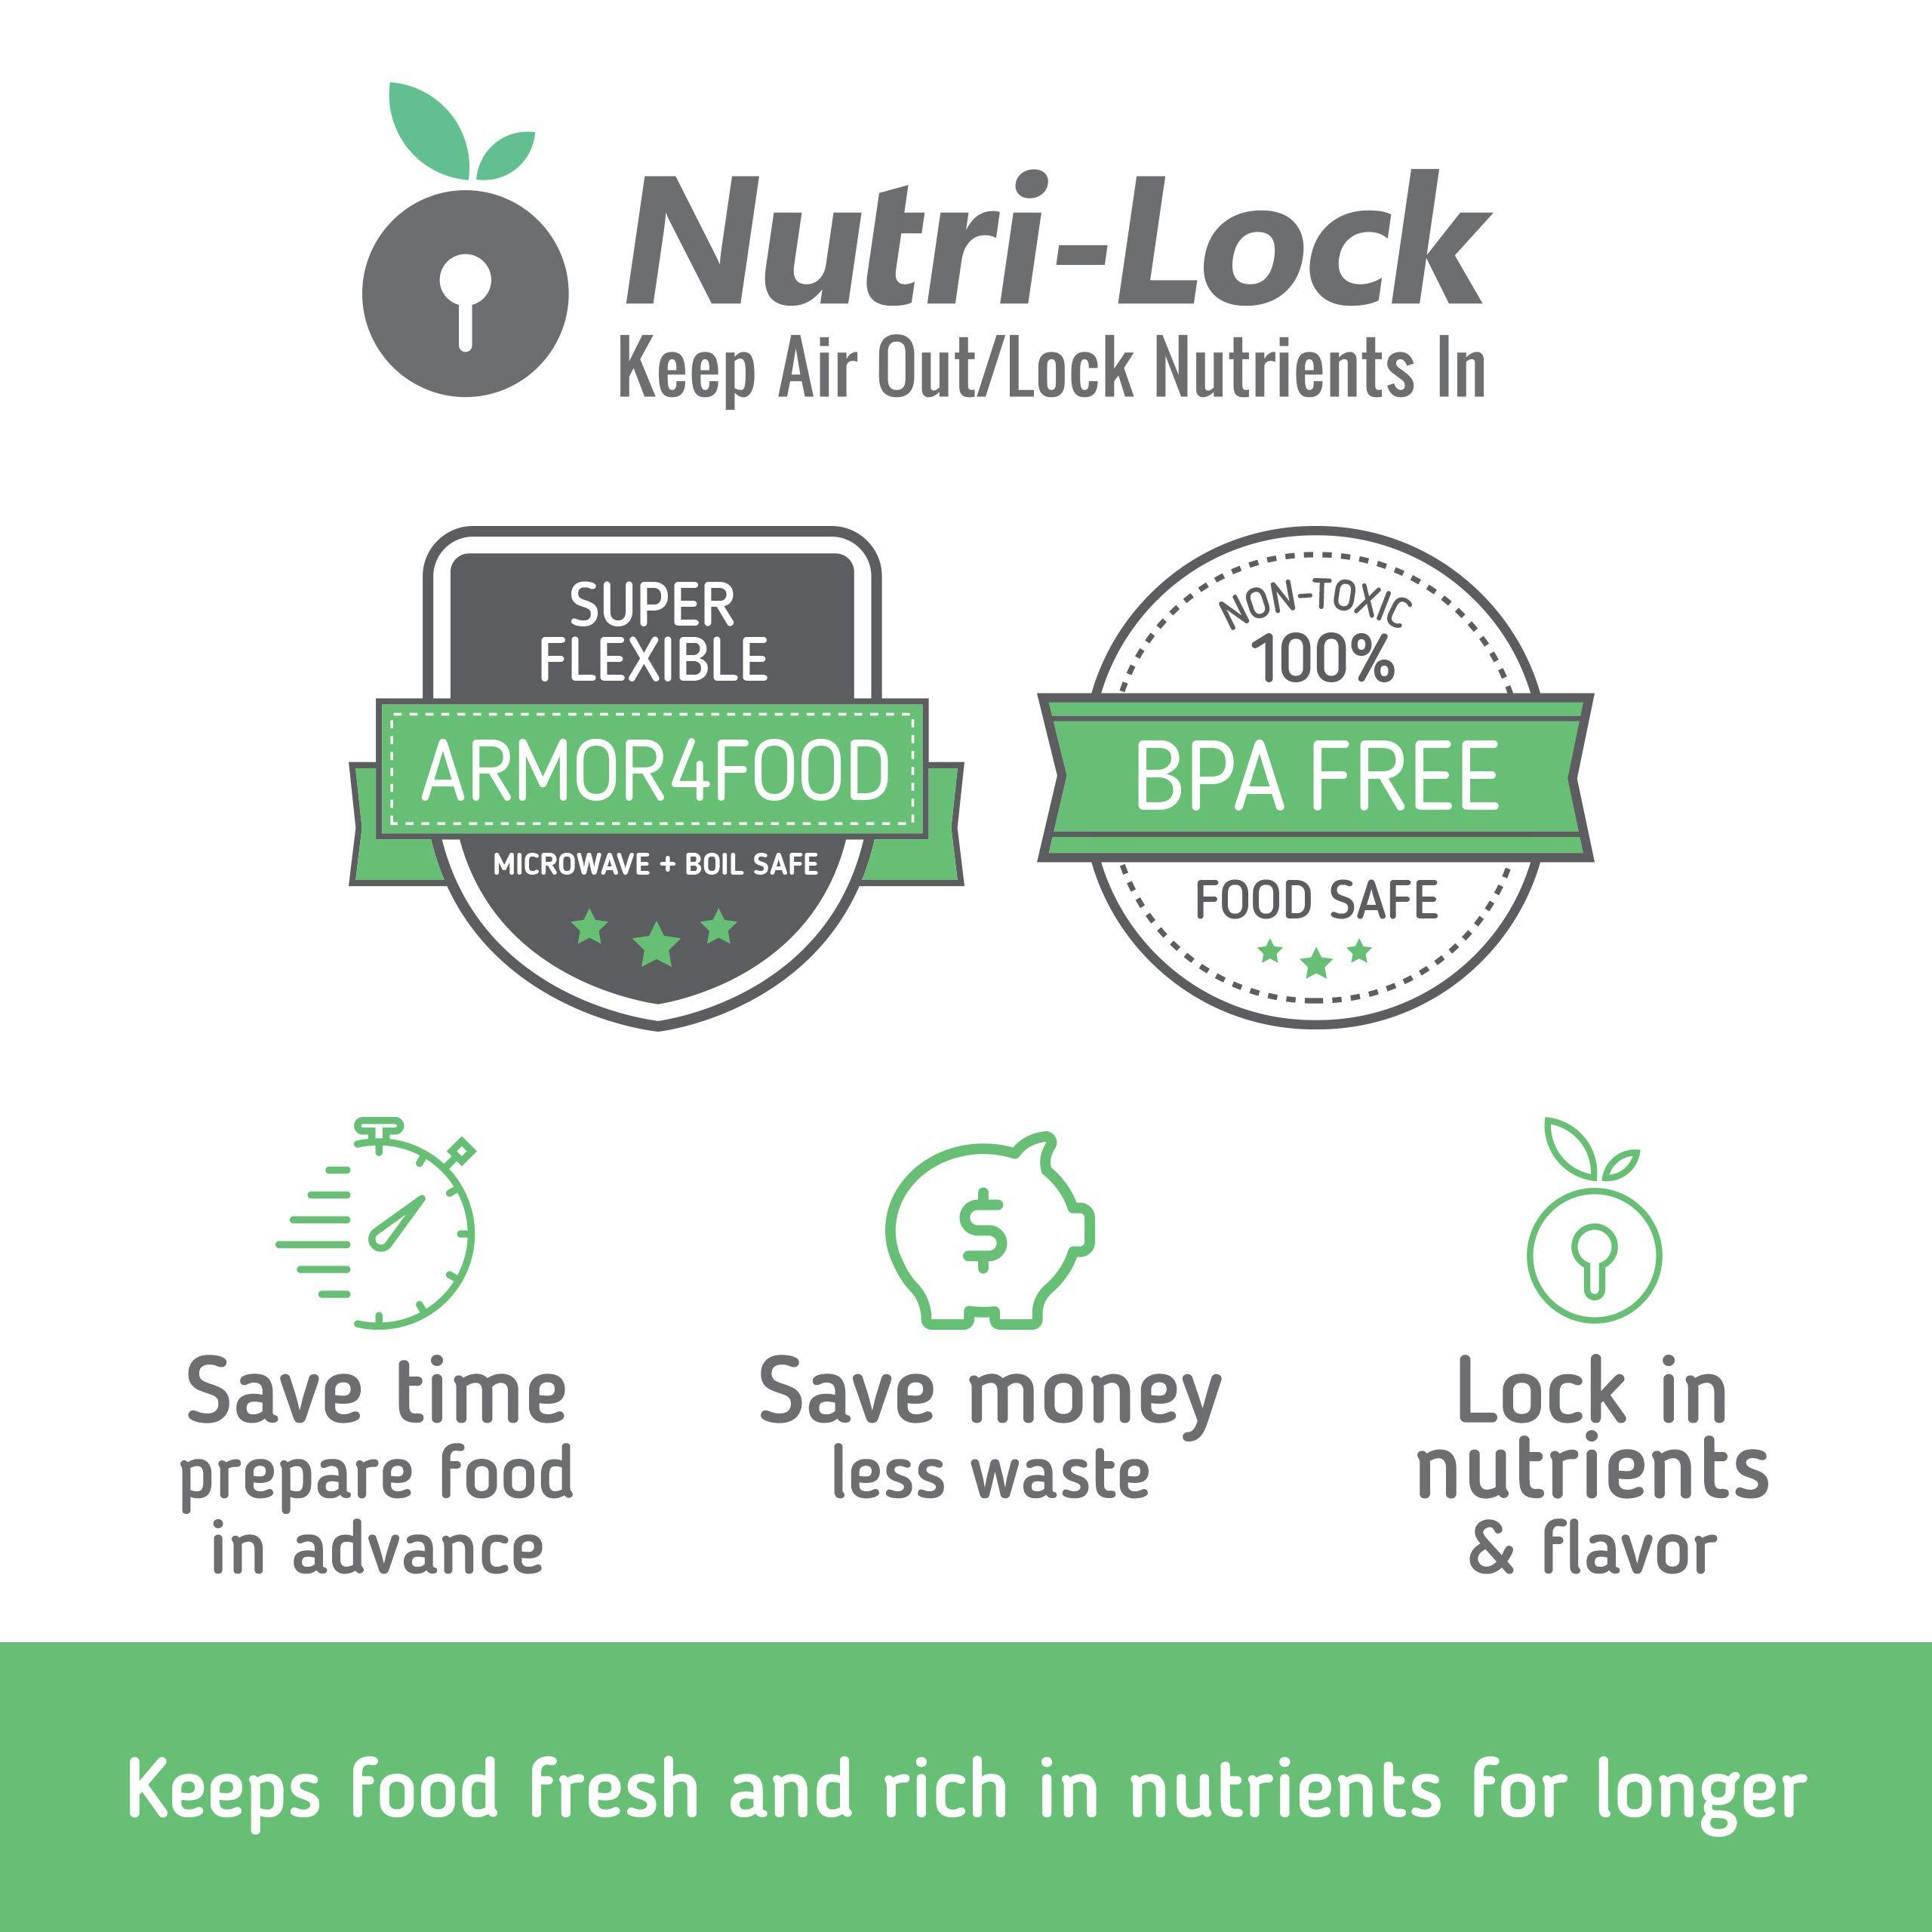 Nutri-Lock Vacuum Sealer Bags. 100 Gallon Bags 11x16 Inch. Commercial Grade Food Sealer Bags for FoodSaver, Sous Vide by Nutri-Lock (Image #1)